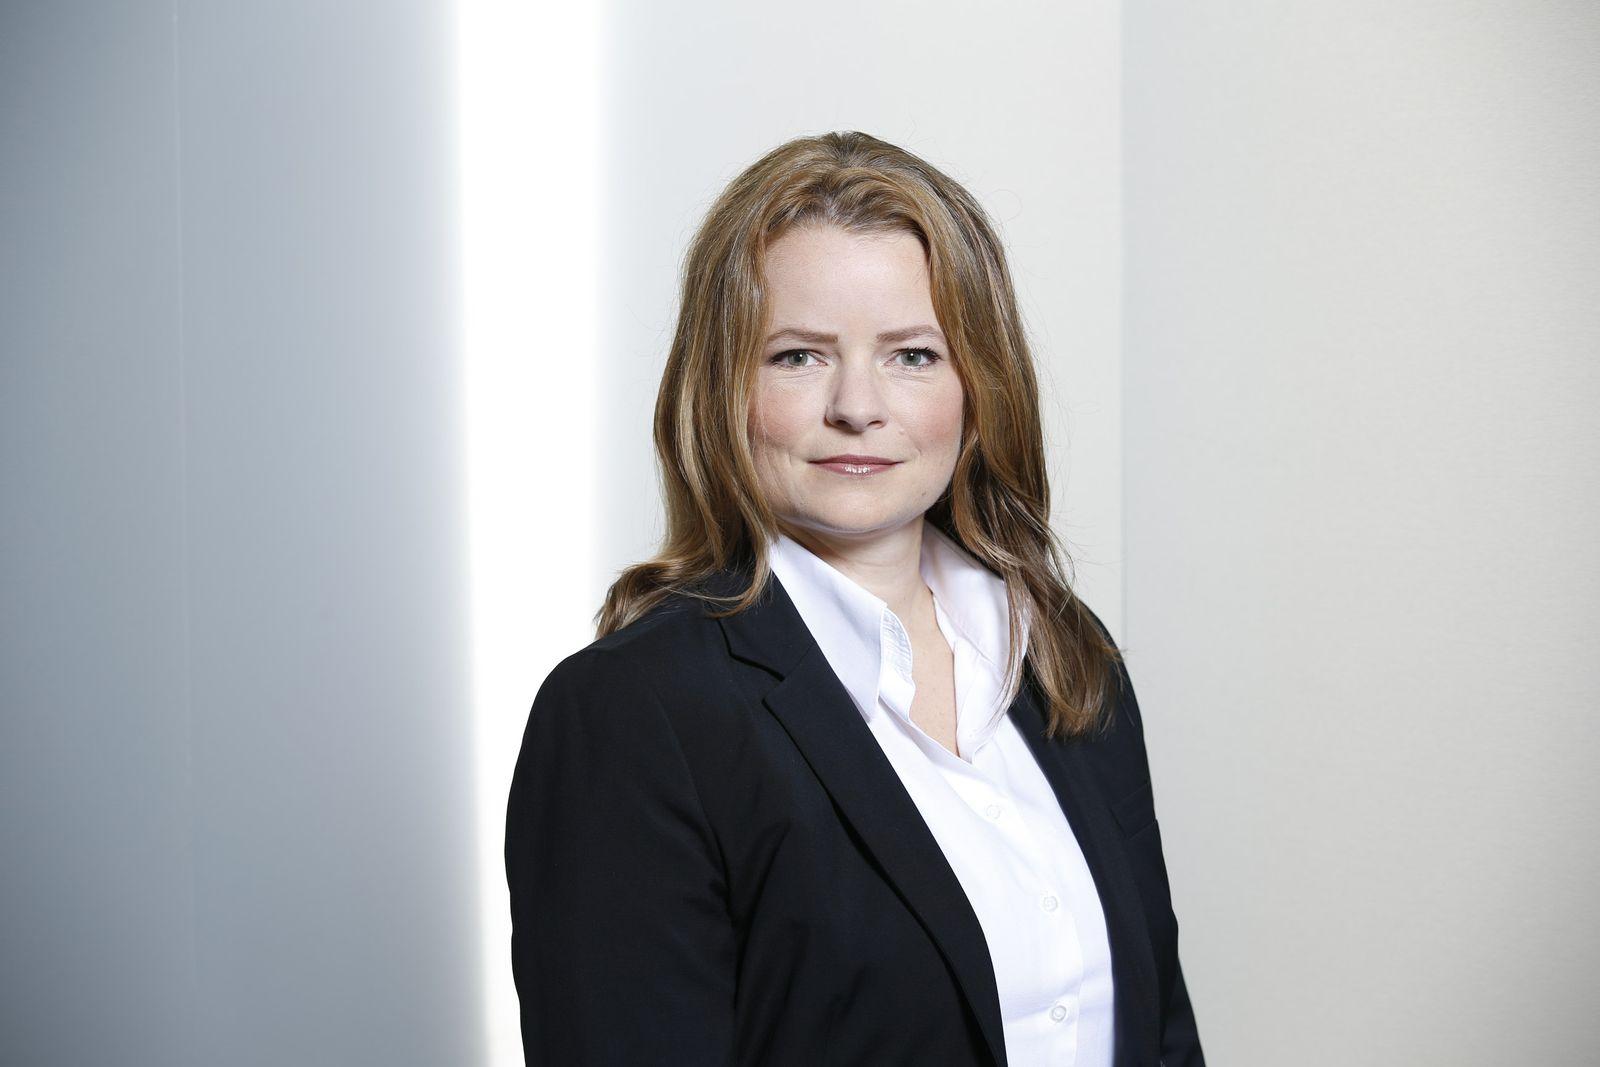 Angelika Wetzstein